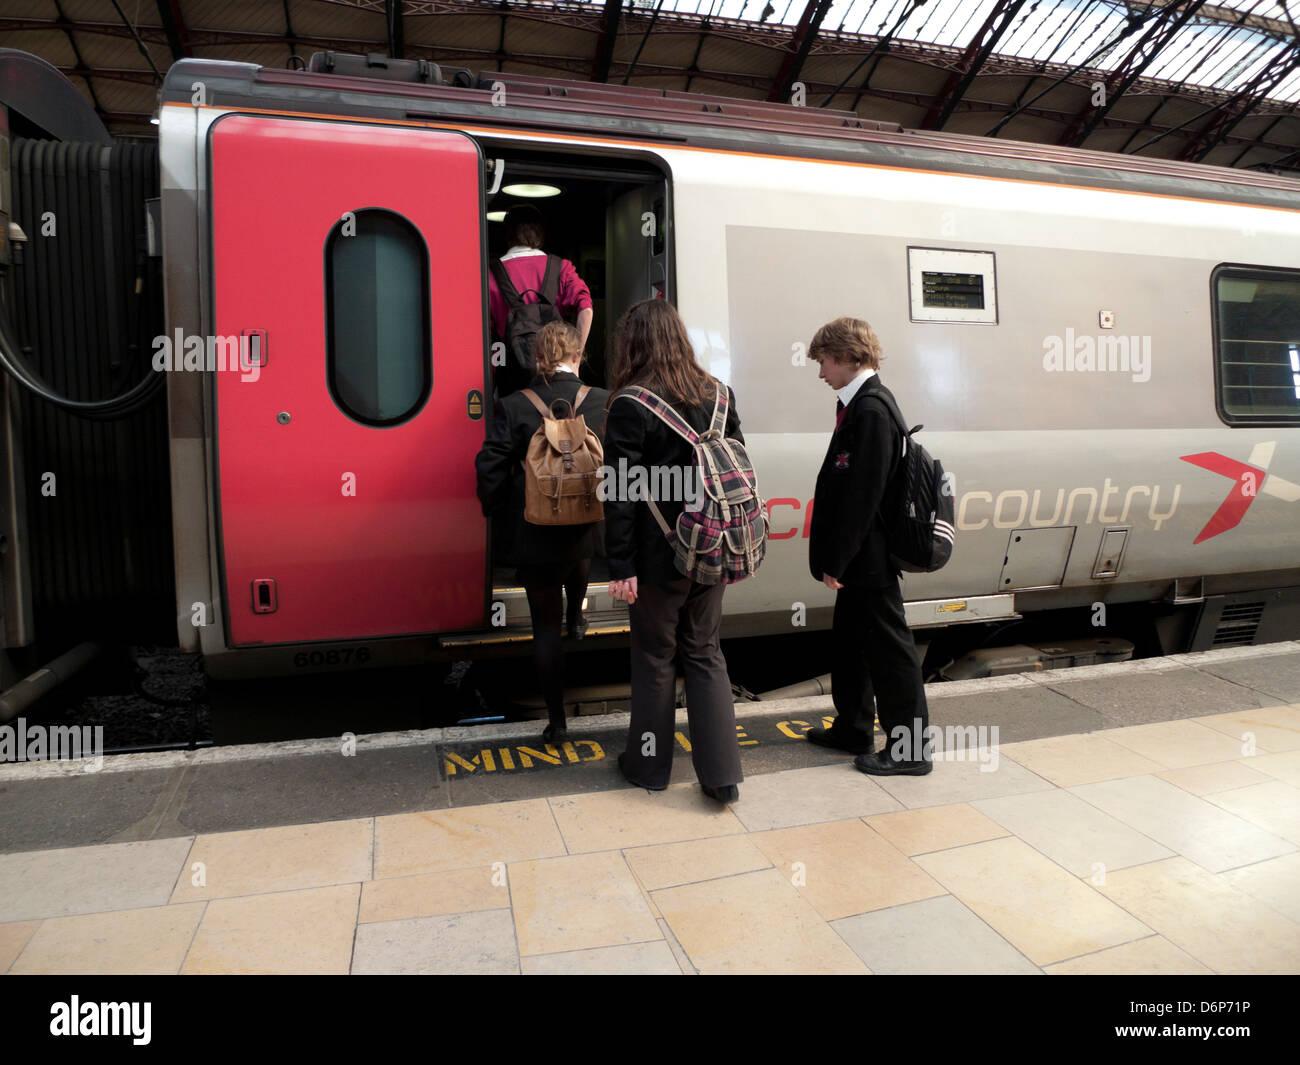 Schoolchildren in uniform boarding a train to commute home from school Bristol Temple Meads Railway Station England - Stock Image